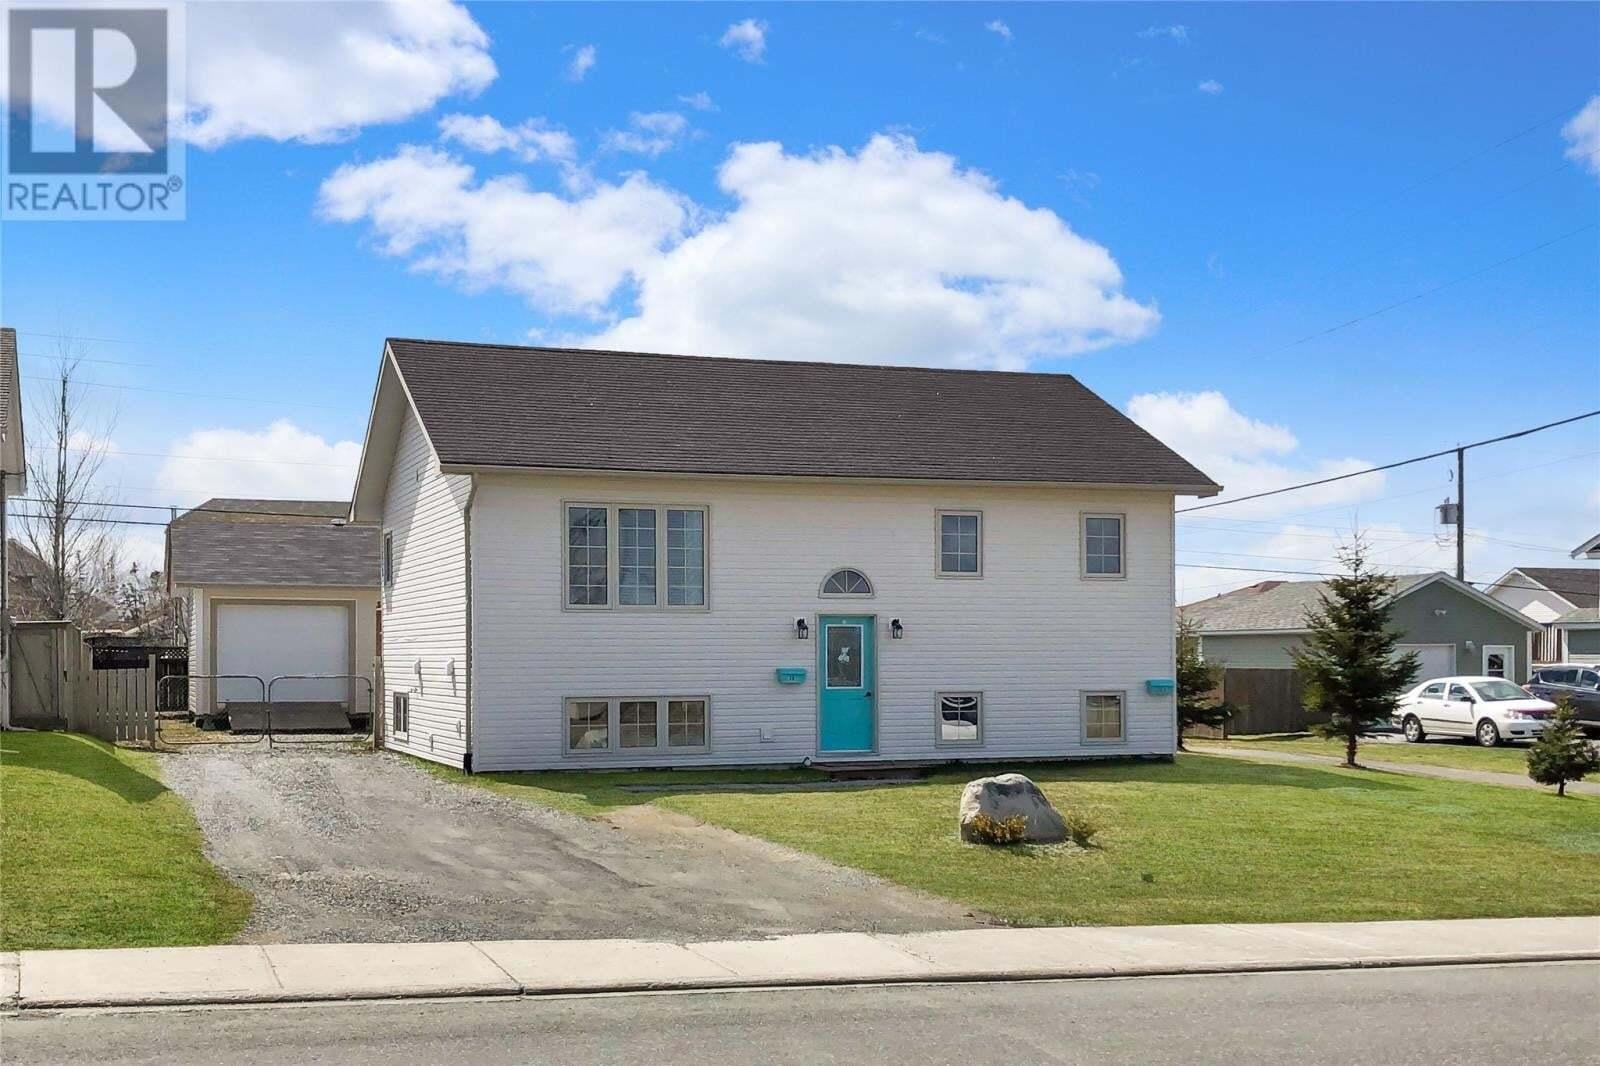 House for sale at 30 Airport Blvd Gander Newfoundland - MLS: 1213895